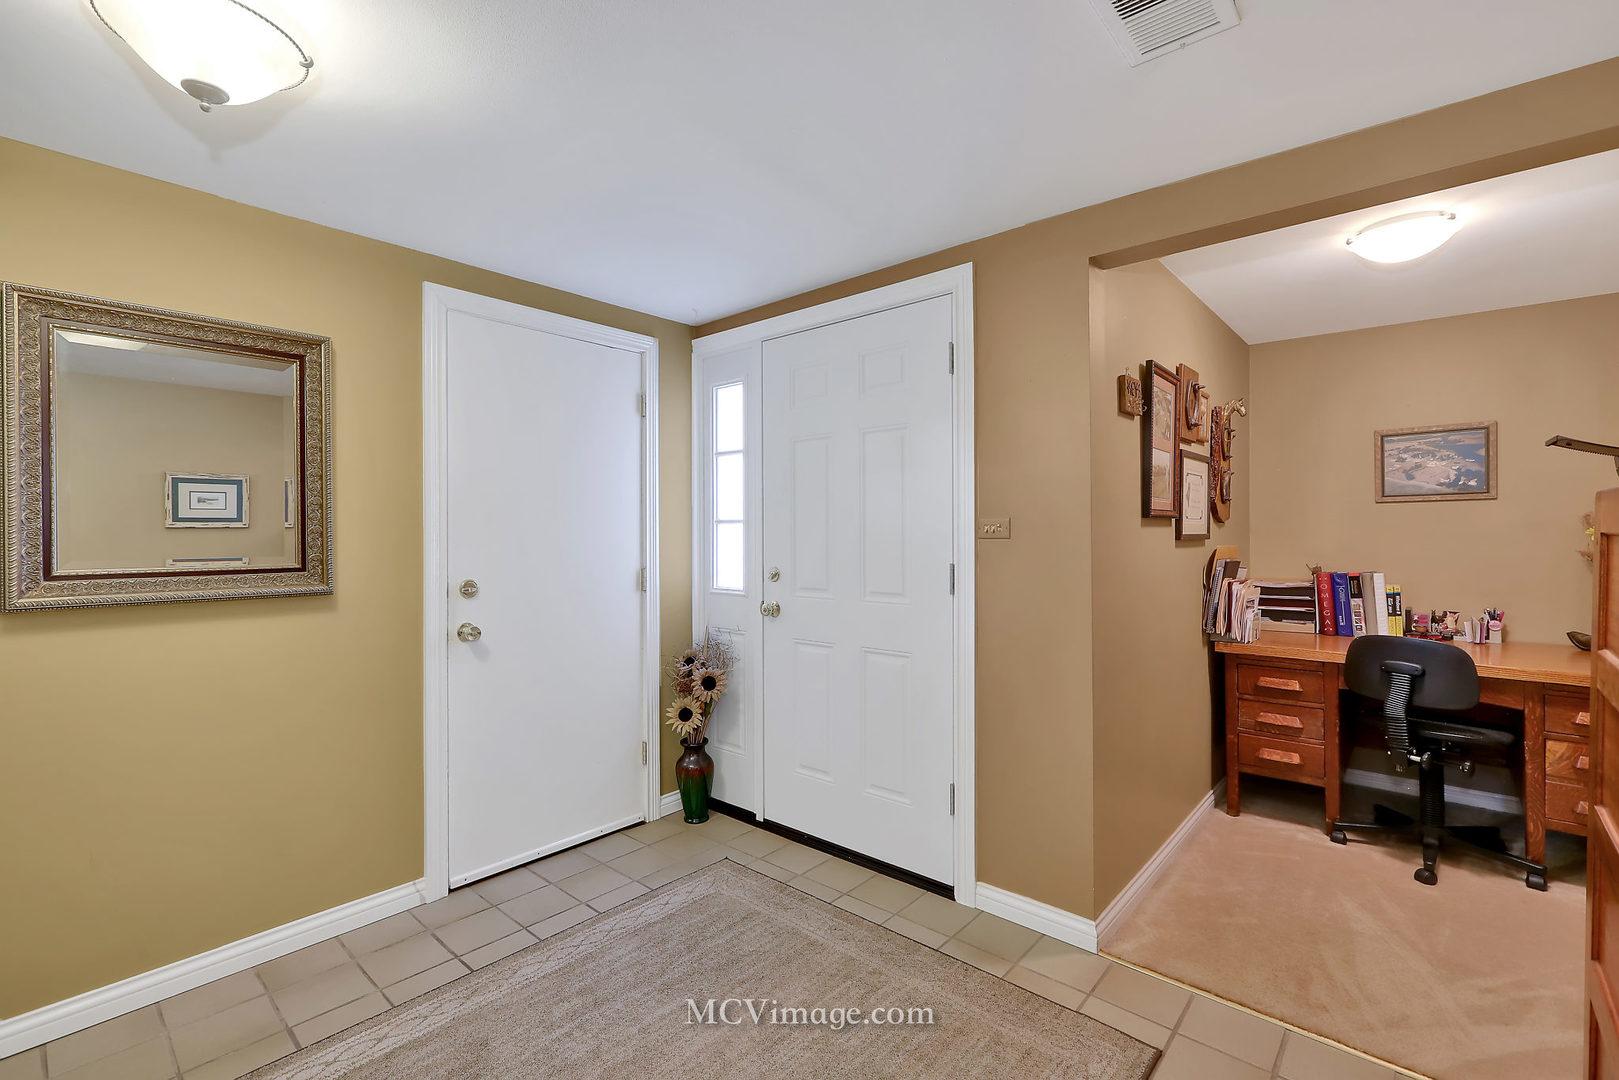 496 CANTERBURY, Roselle, Illinois, 60172